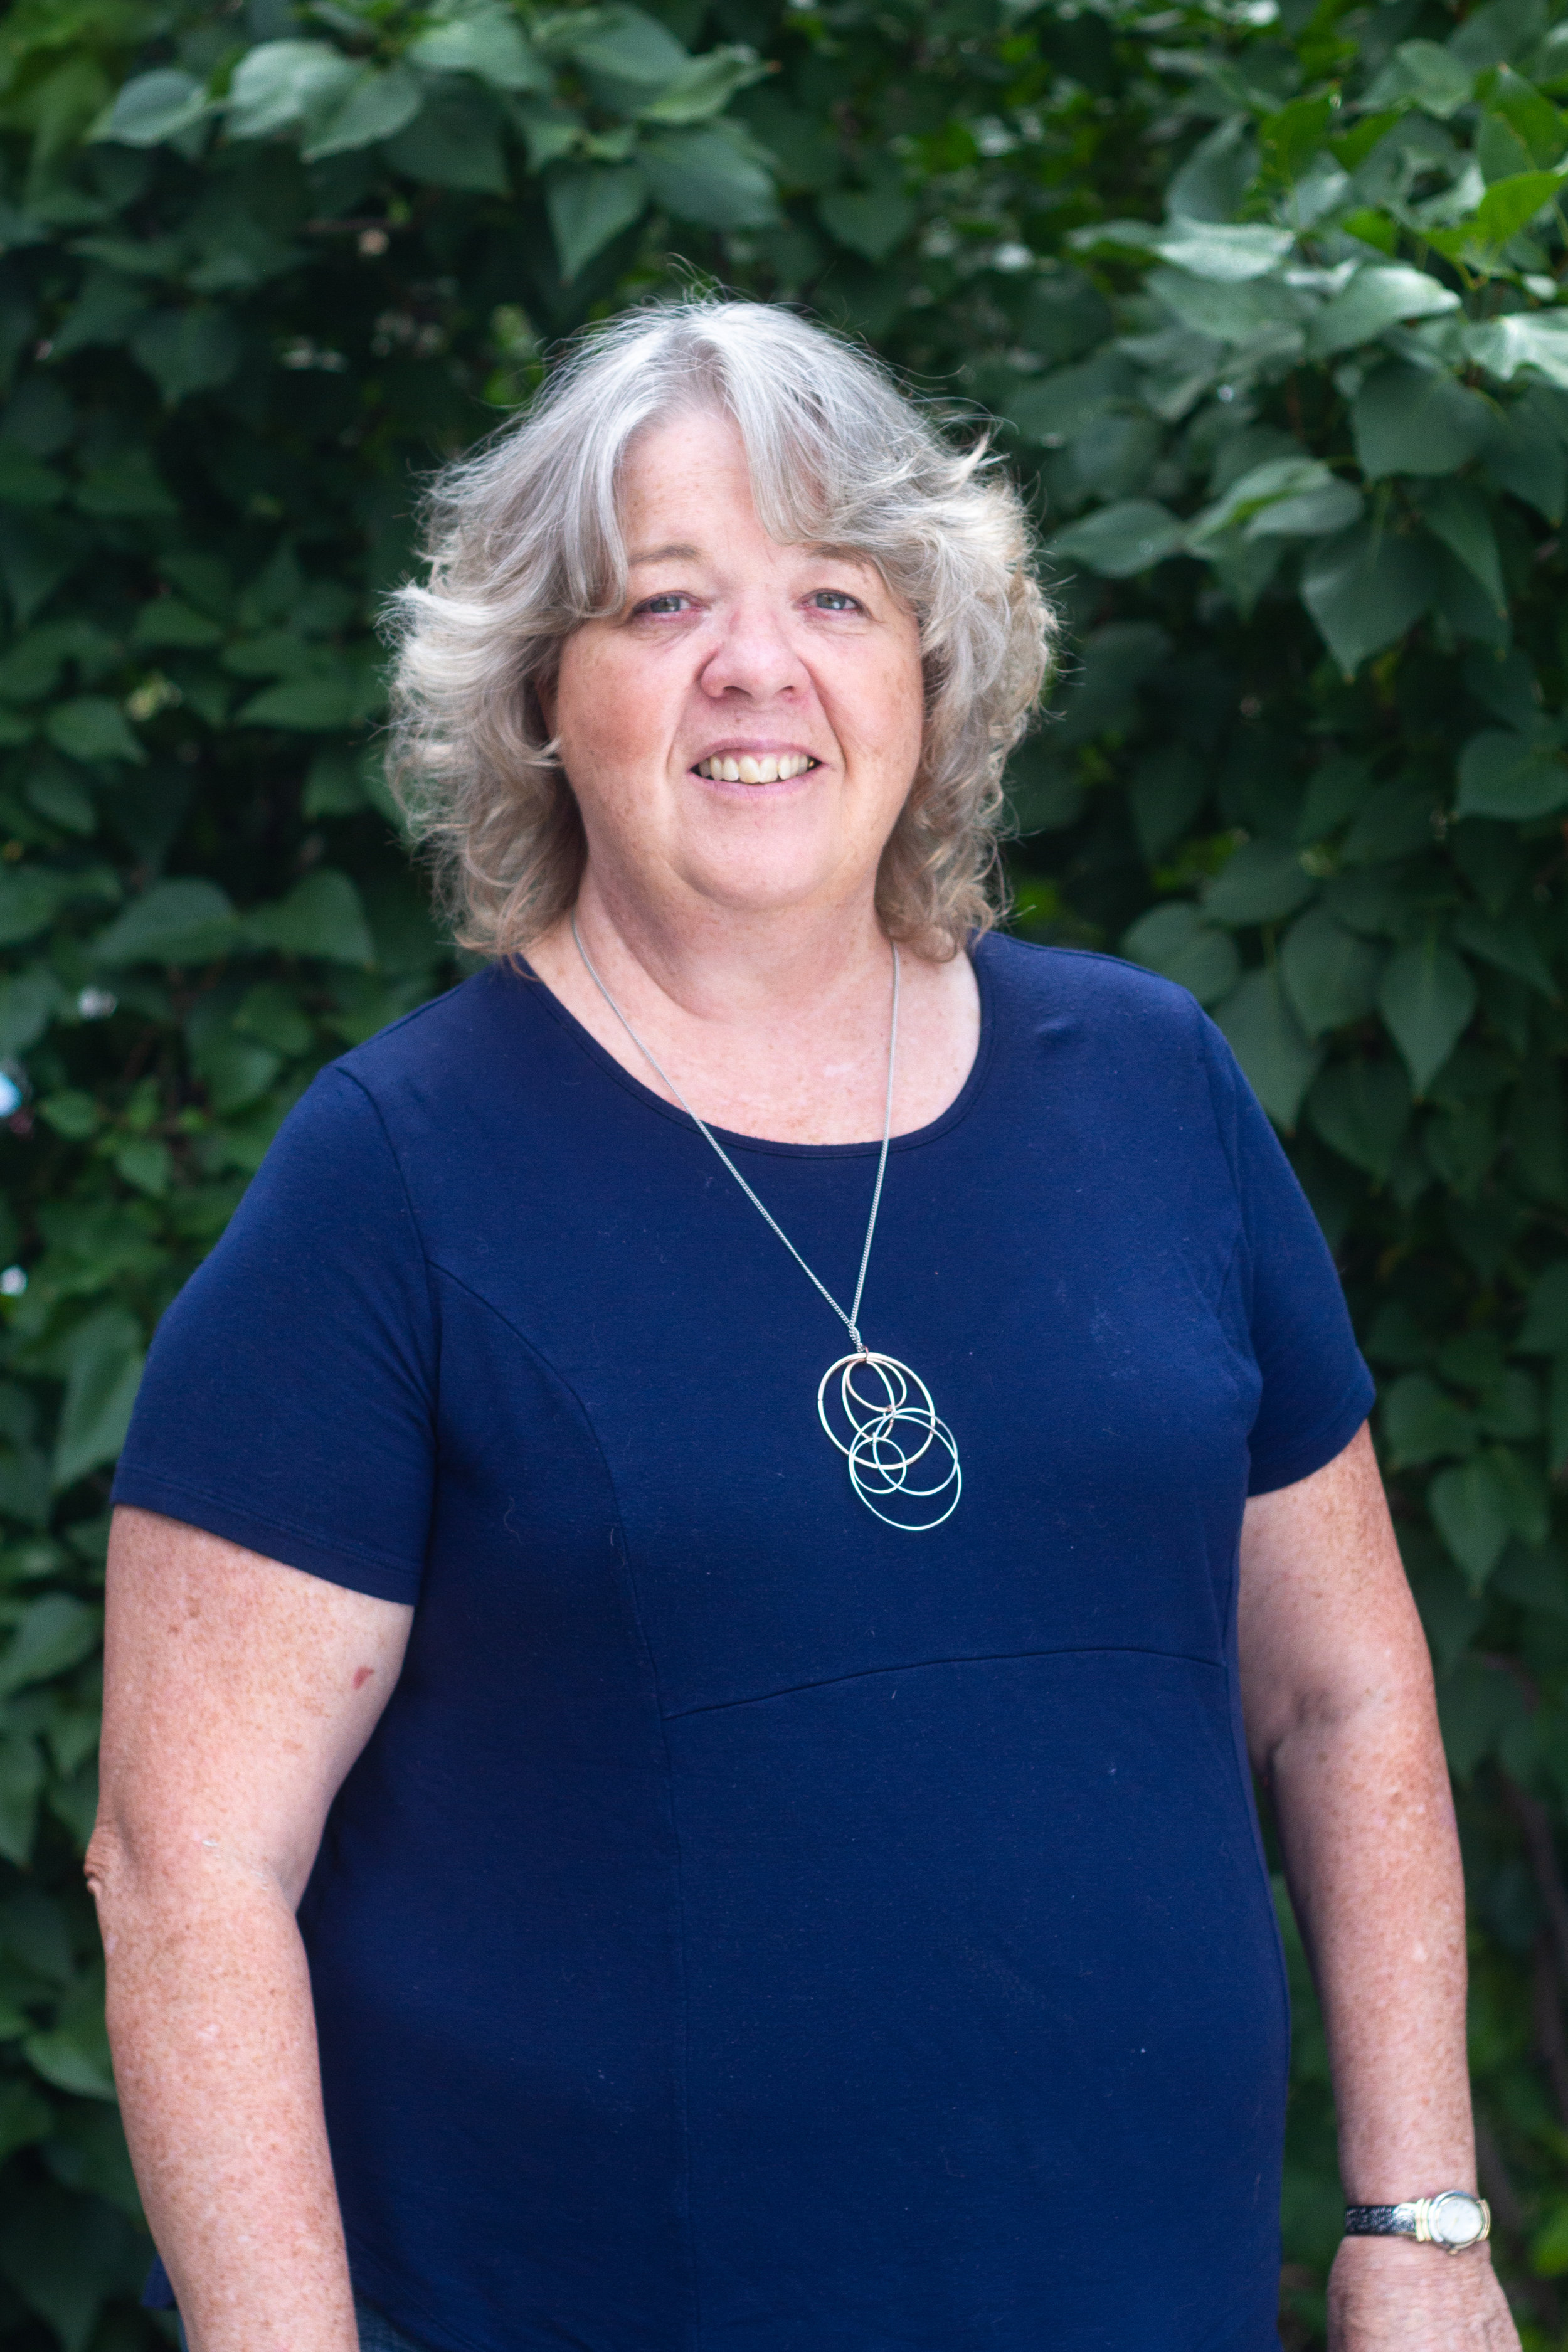 Ann Wyatt, CPC